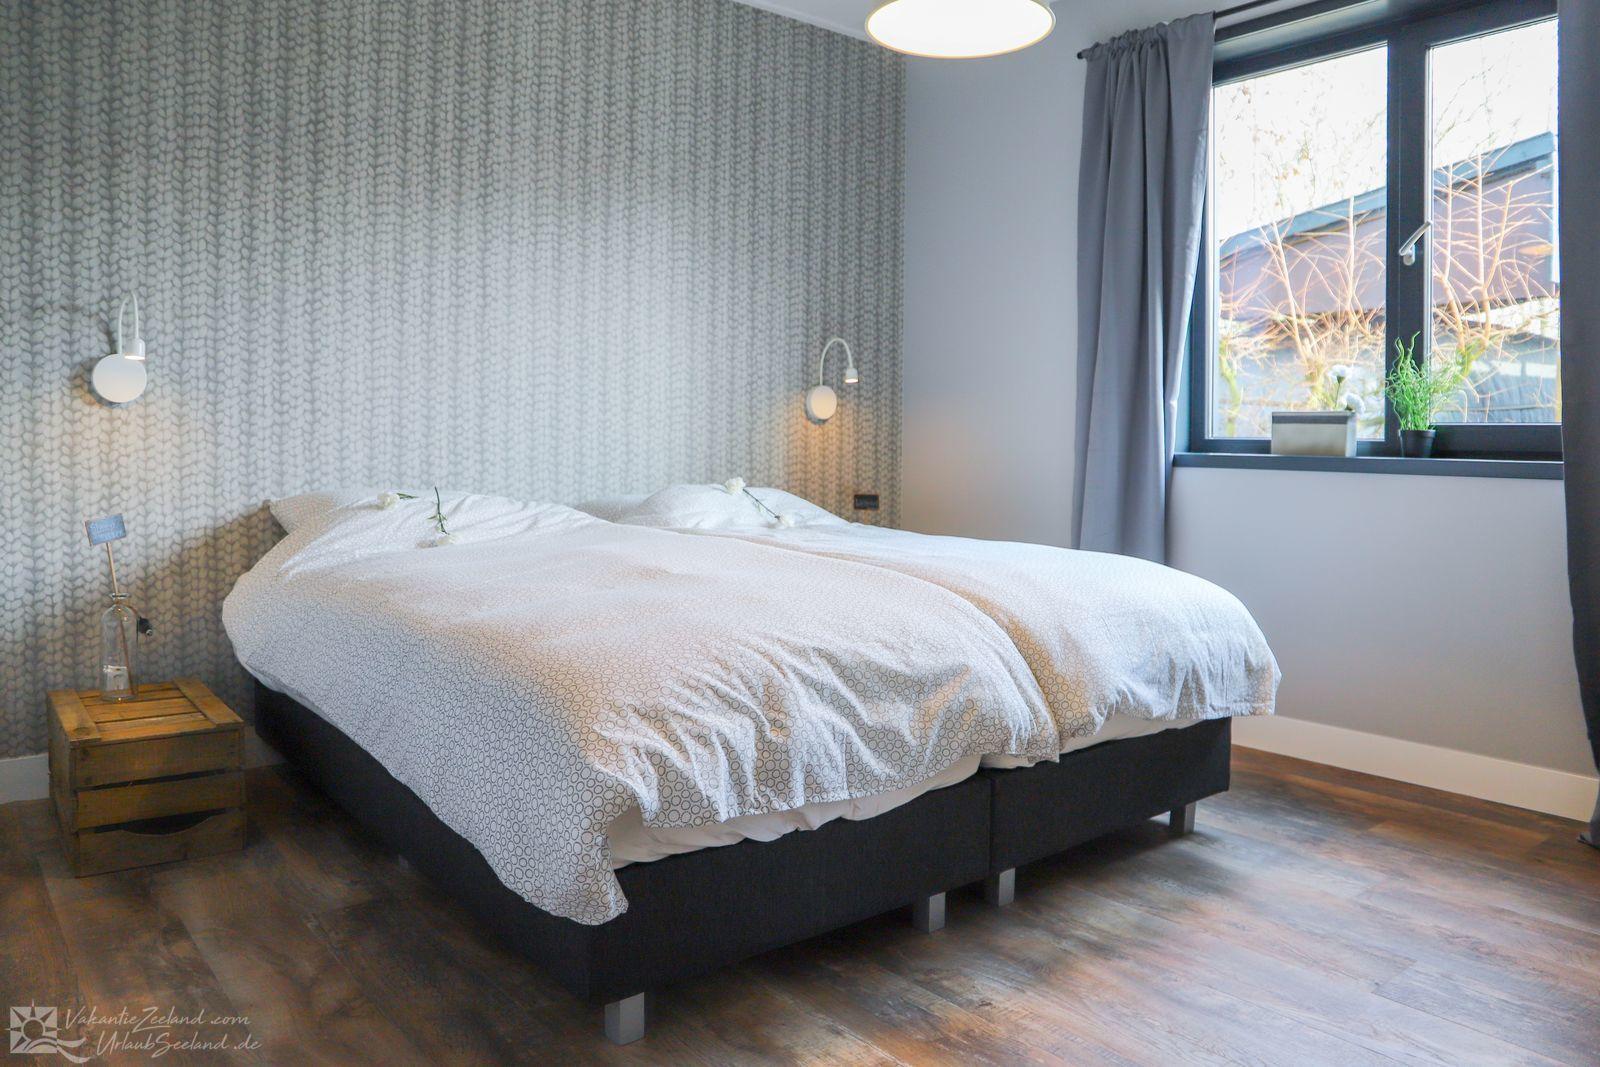 VZ760 Vakantiewoning in Baarland